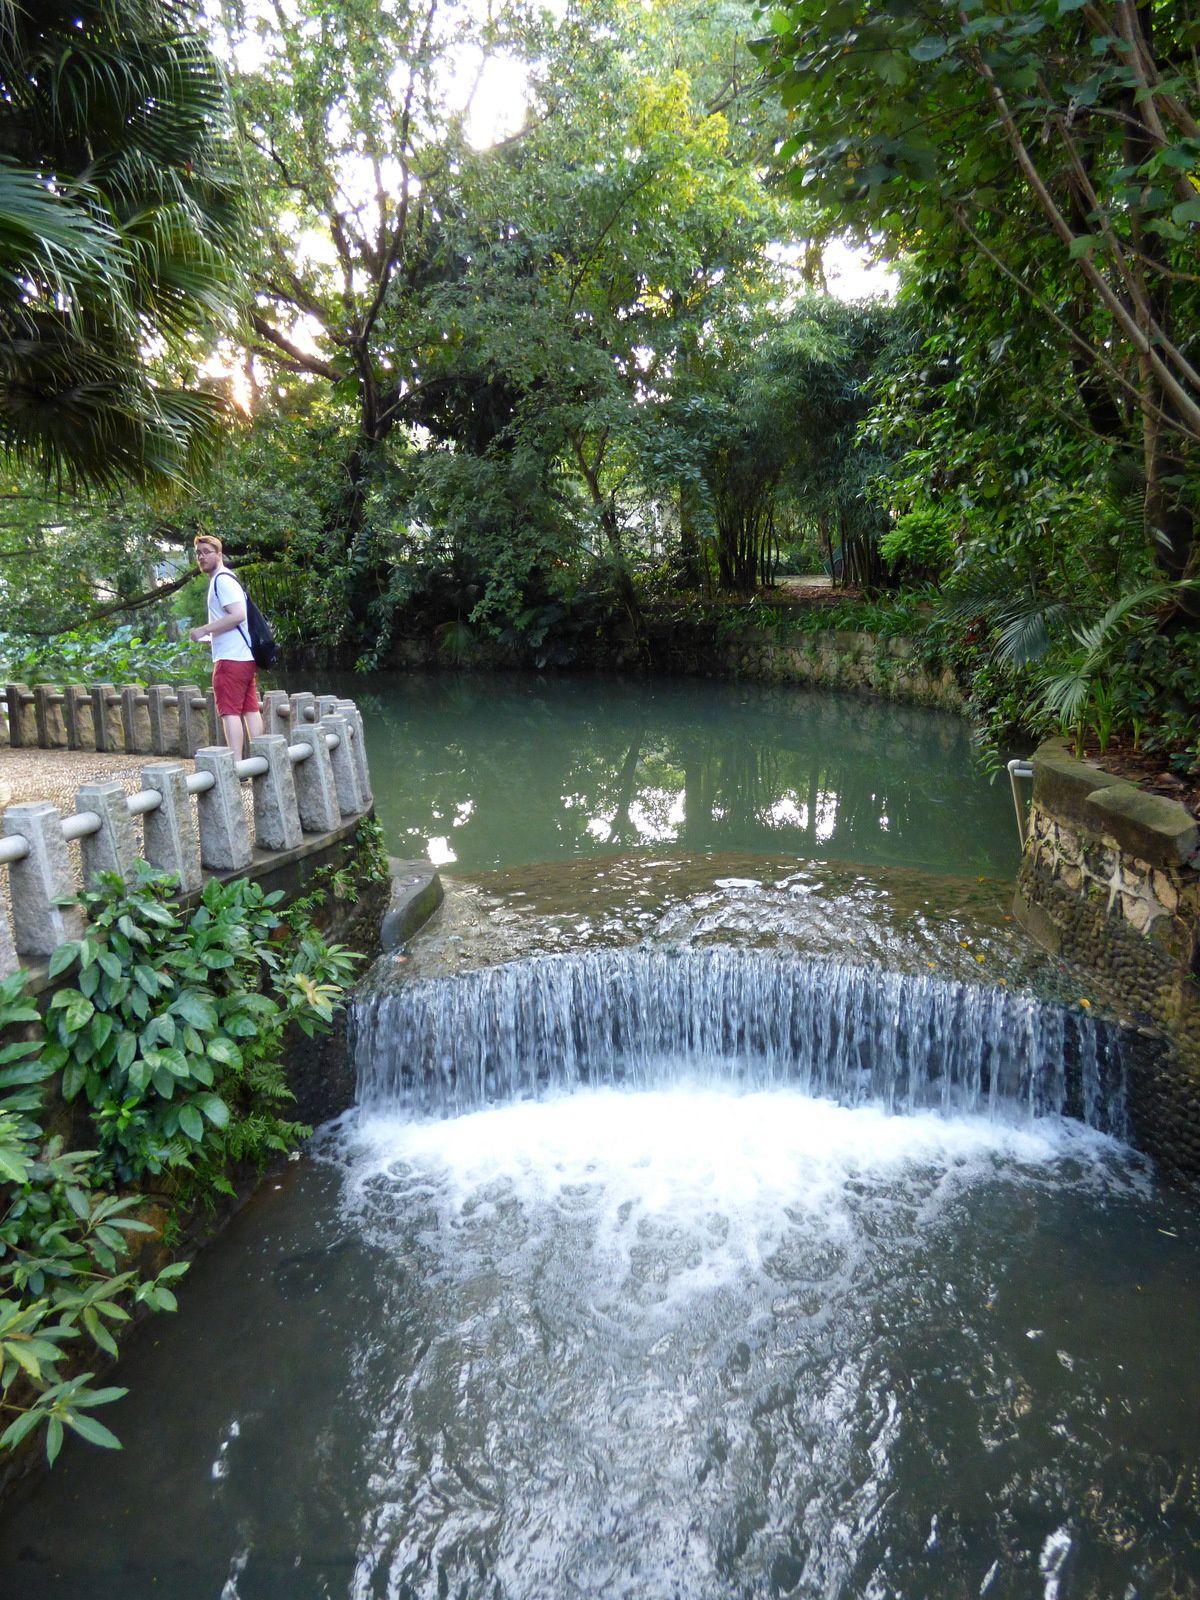 Le parc Lizhi 荔枝公园 - Shenzhen 深圳 - Chine中国